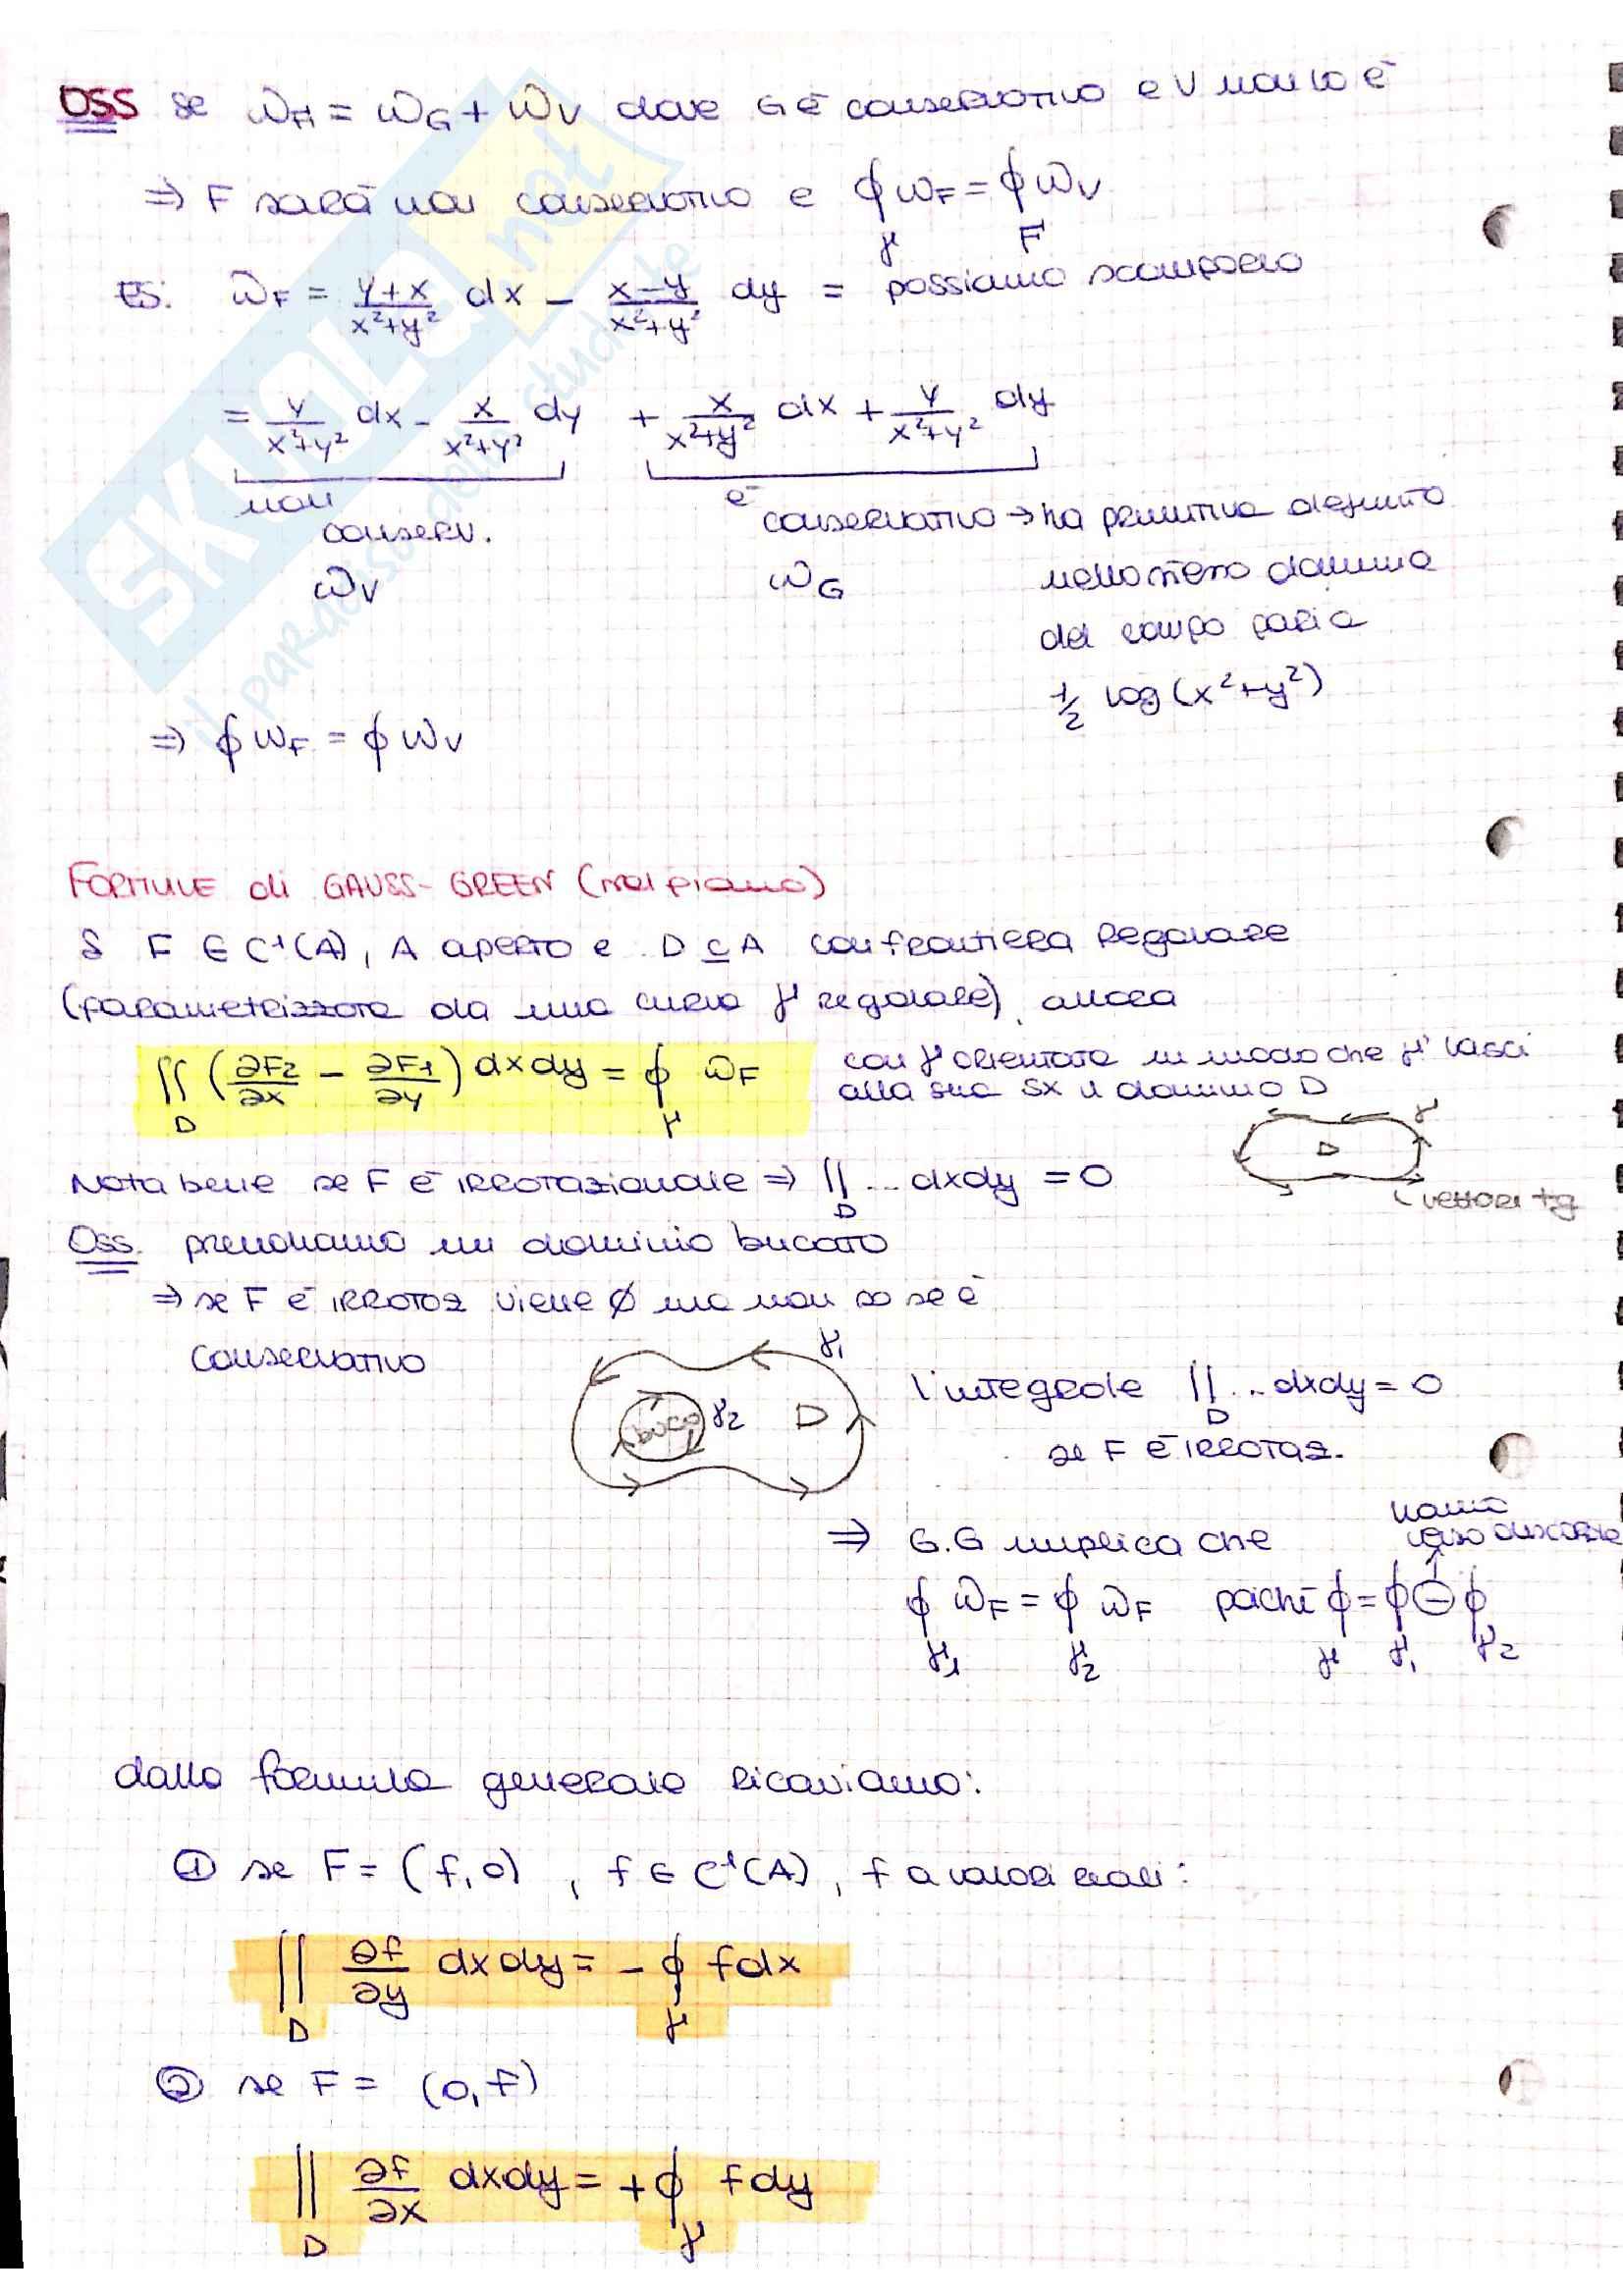 Formule di Gauss Green